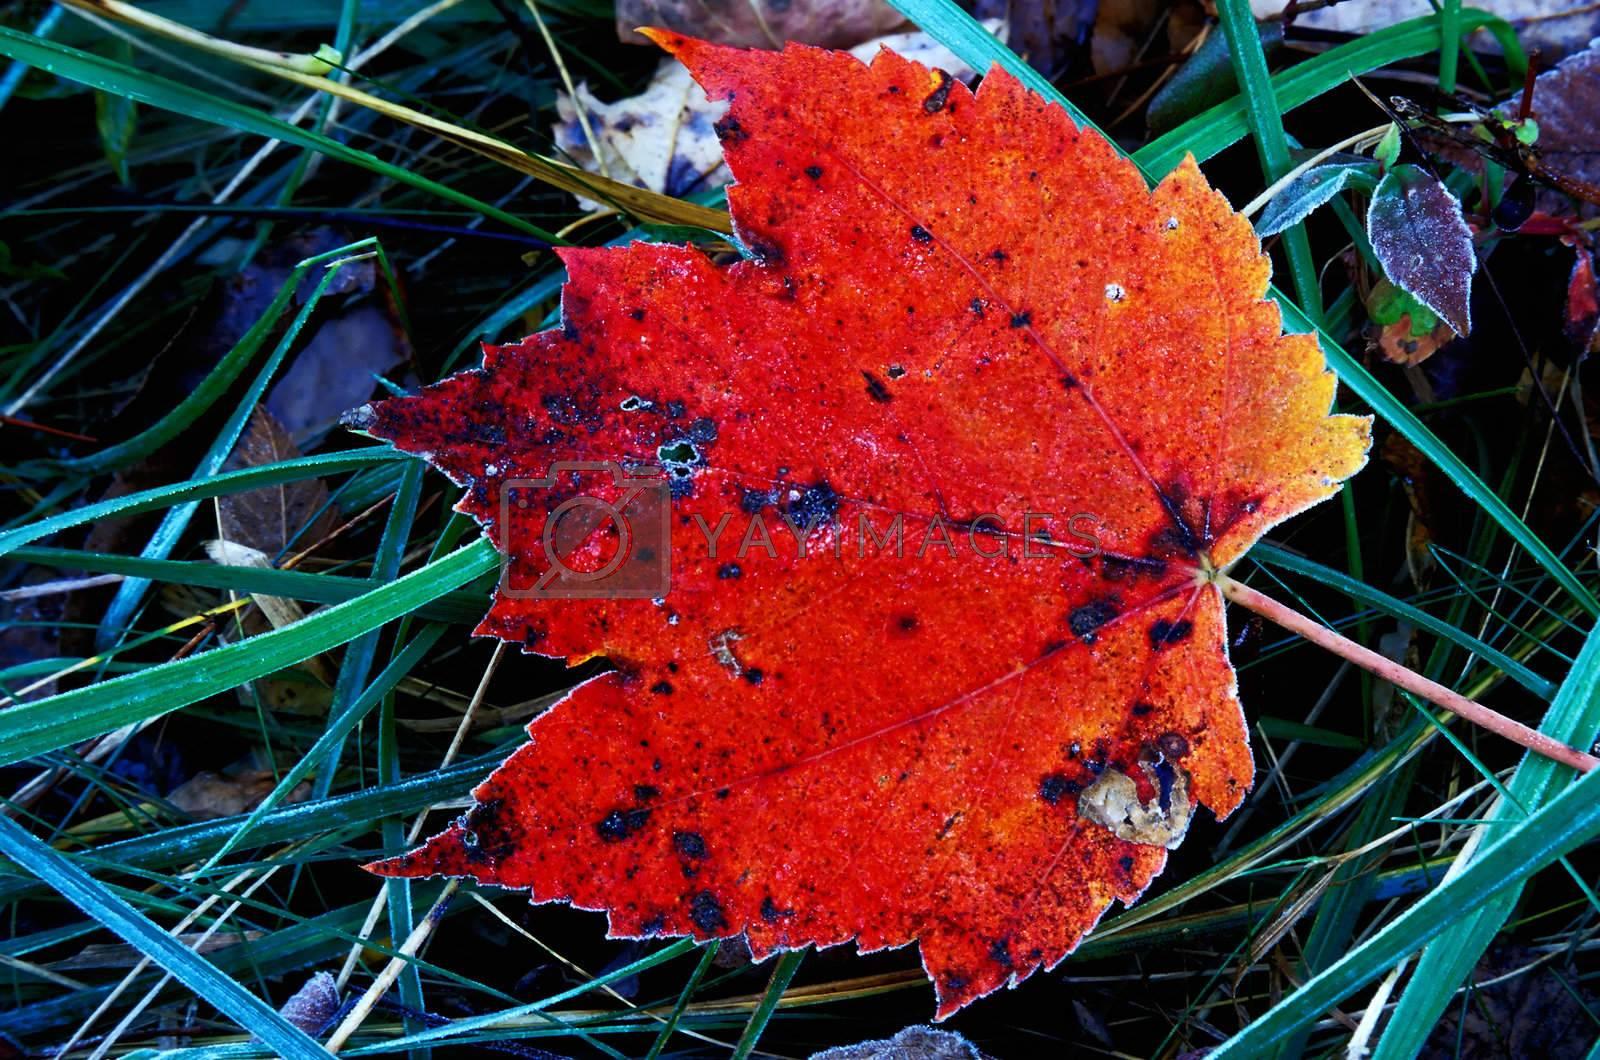 Maple leaf on frosting morning.